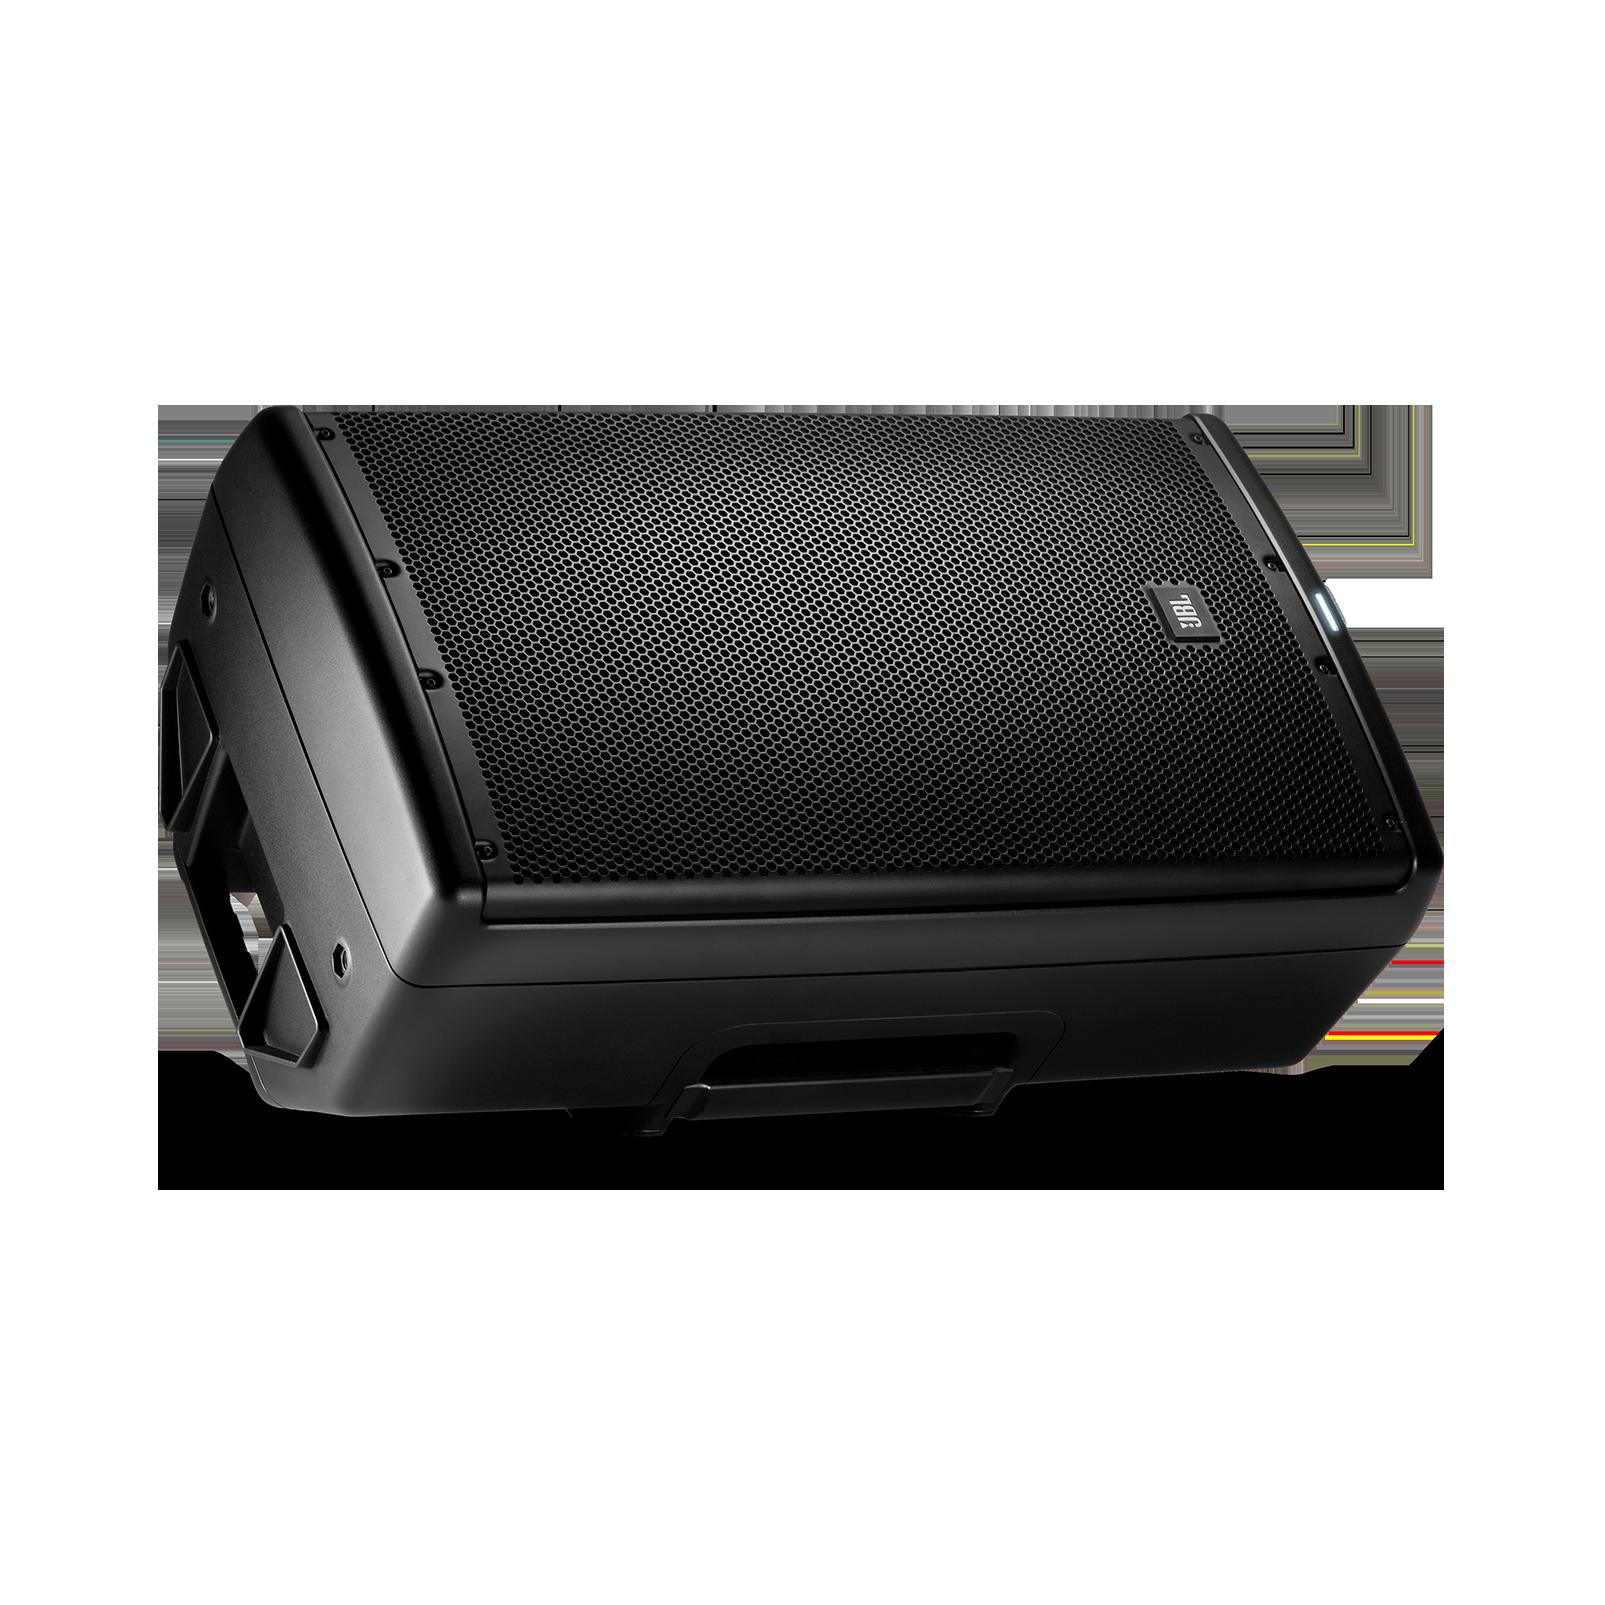 "JBL EON612 - Black - 12"" Two-Way Multipurpose Self-Powered Sound Reinforcement - Detailshot 3"